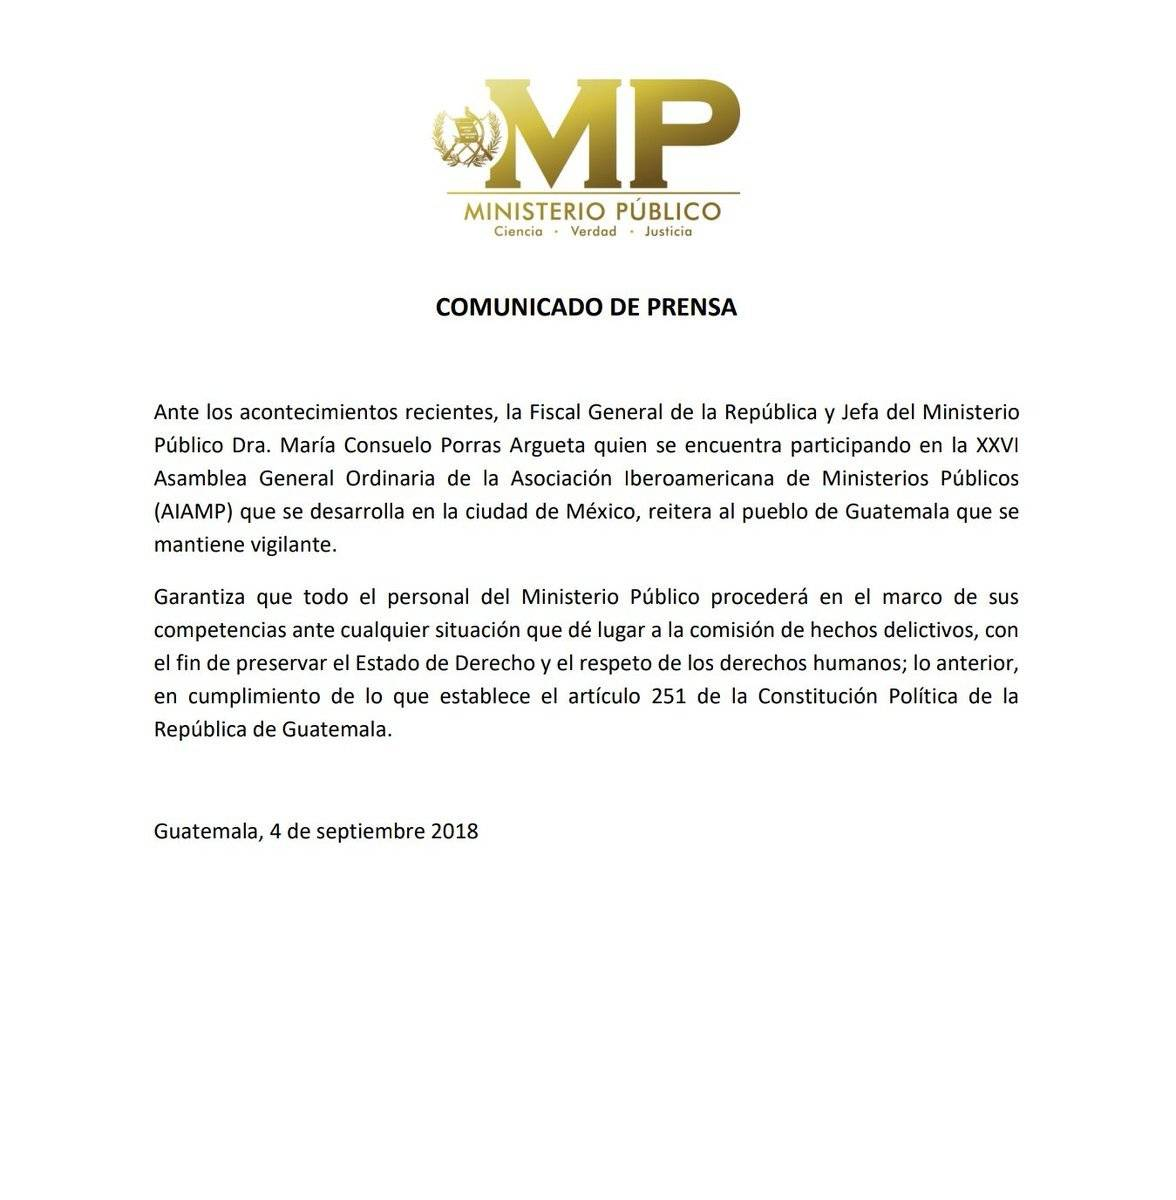 MP comunicado Iván Velásquez